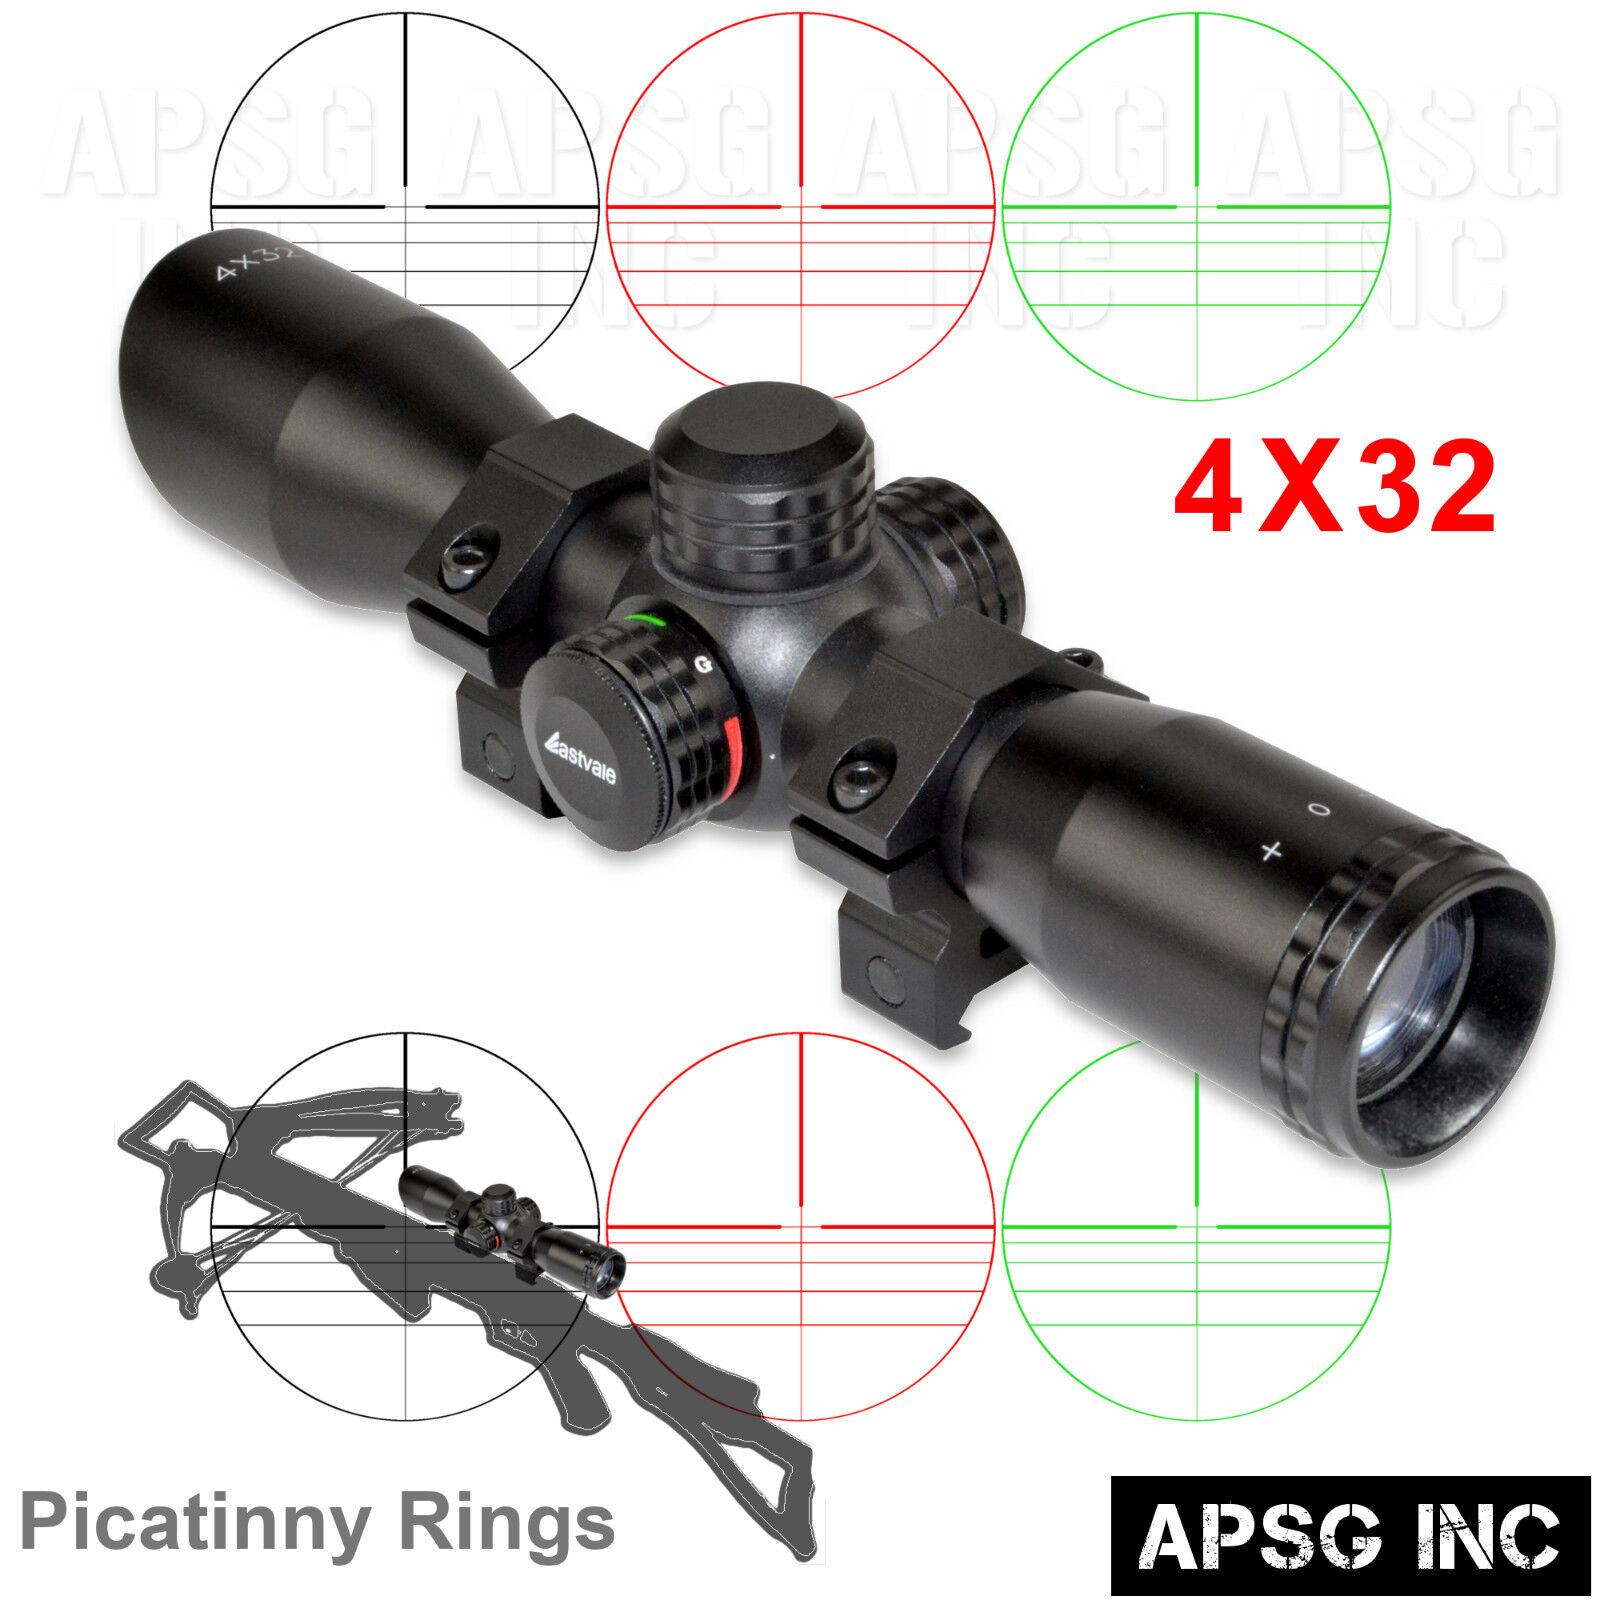 4X32 CROSSBOW Scope w/ Picatinny Rings,Reticle Illumination,